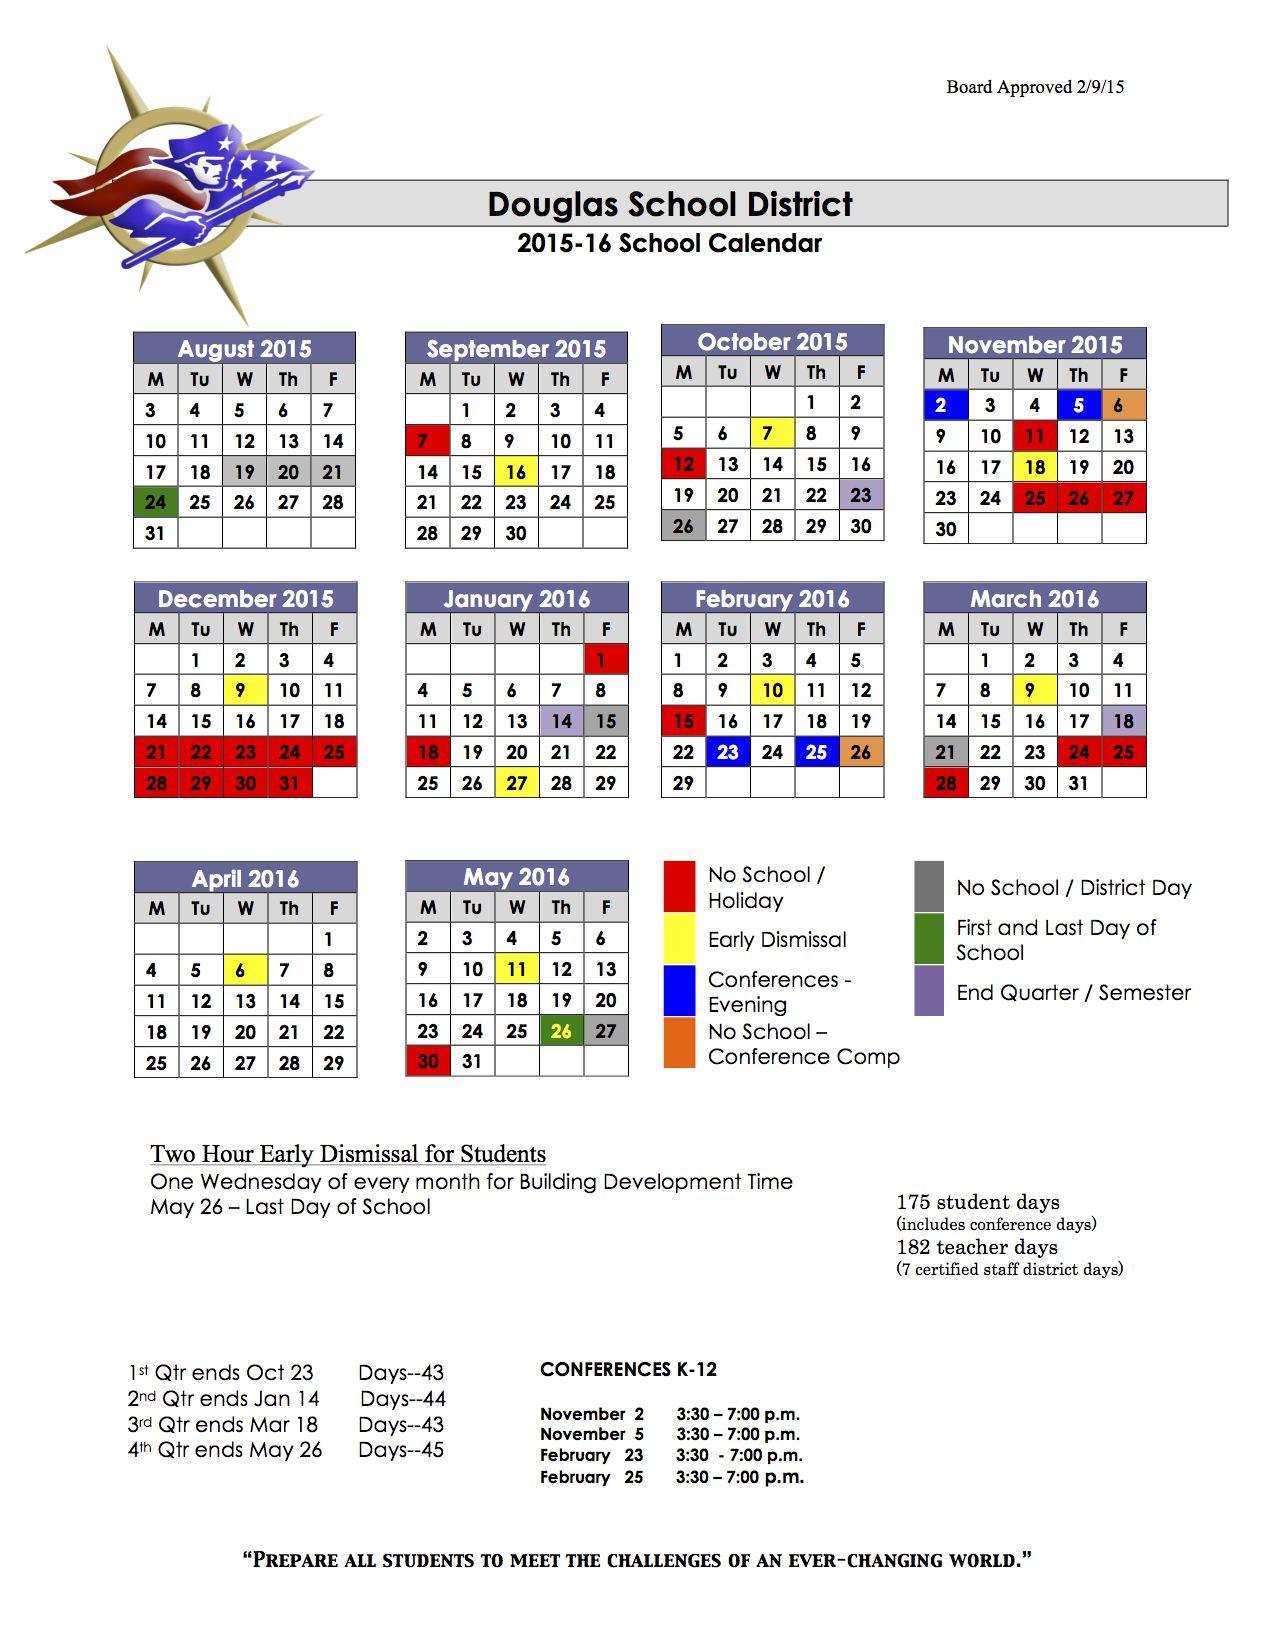 School Calendar For Douglas, Rapid City, Meade And New within Rapid City School District Schedule